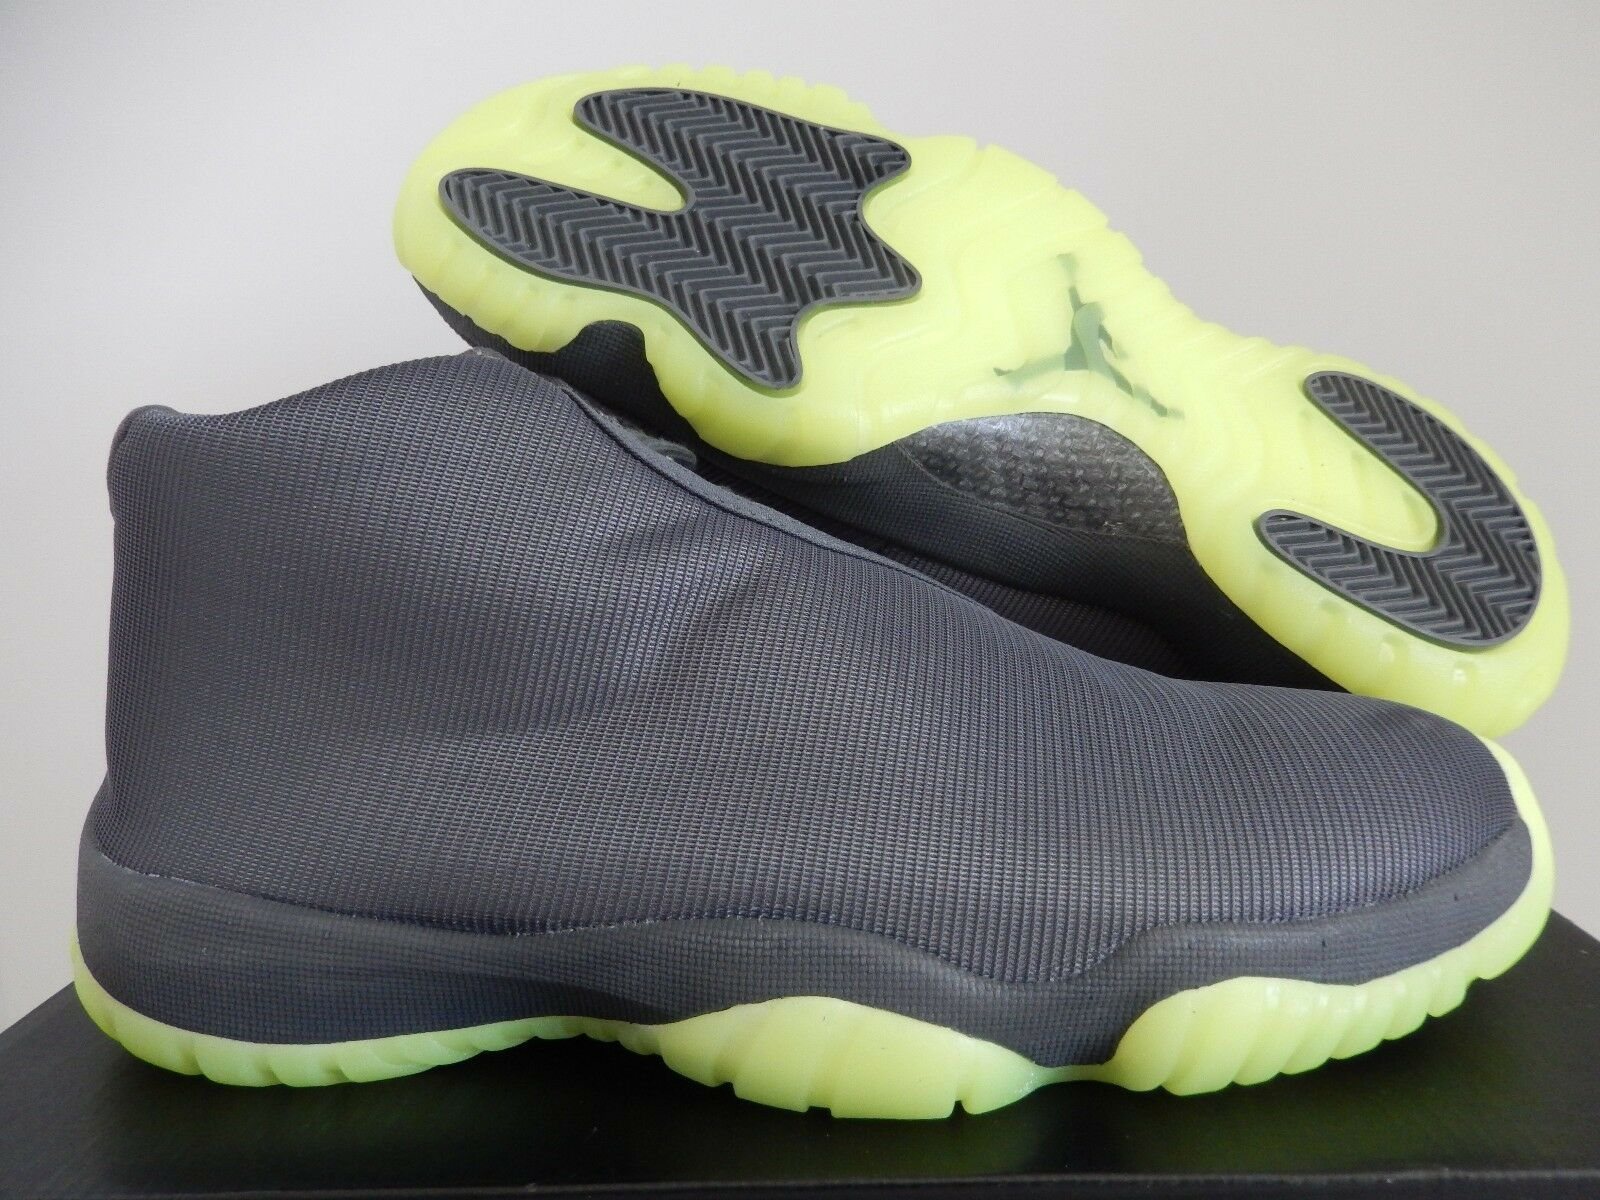 Nike air jordan futuro footscape buio grey-dark grey-volt sz 10 [656503-025]